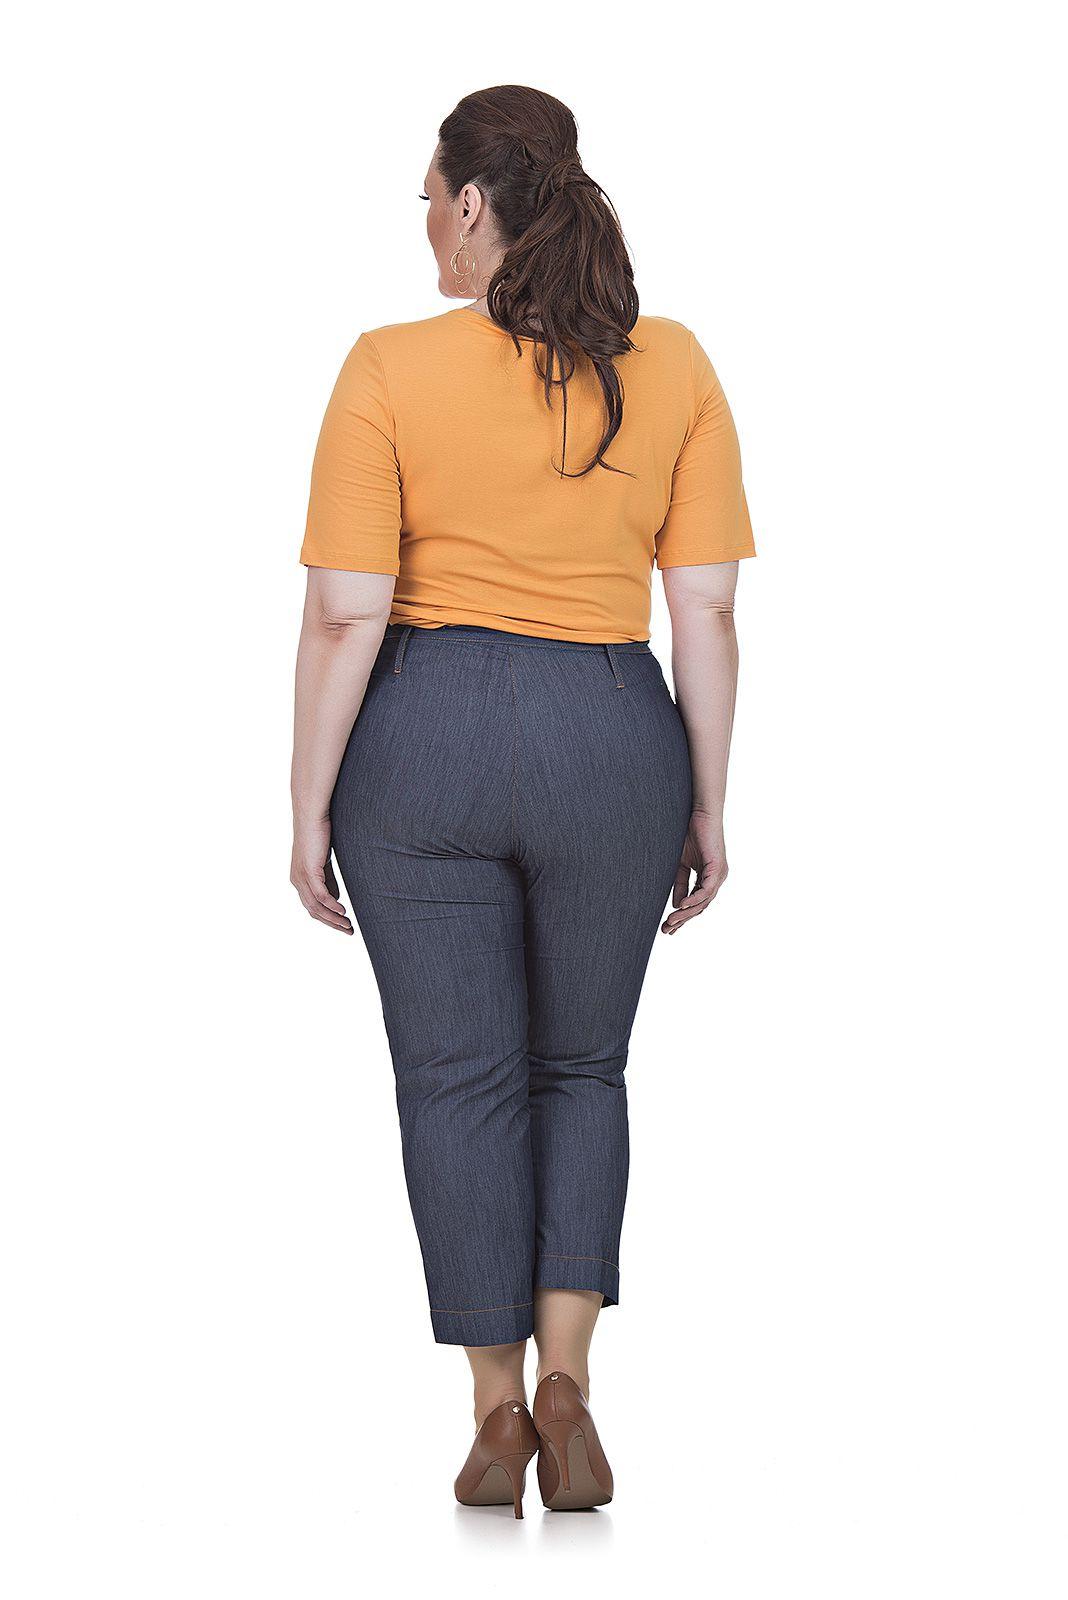 Blusa manga curta de malha Plus Size